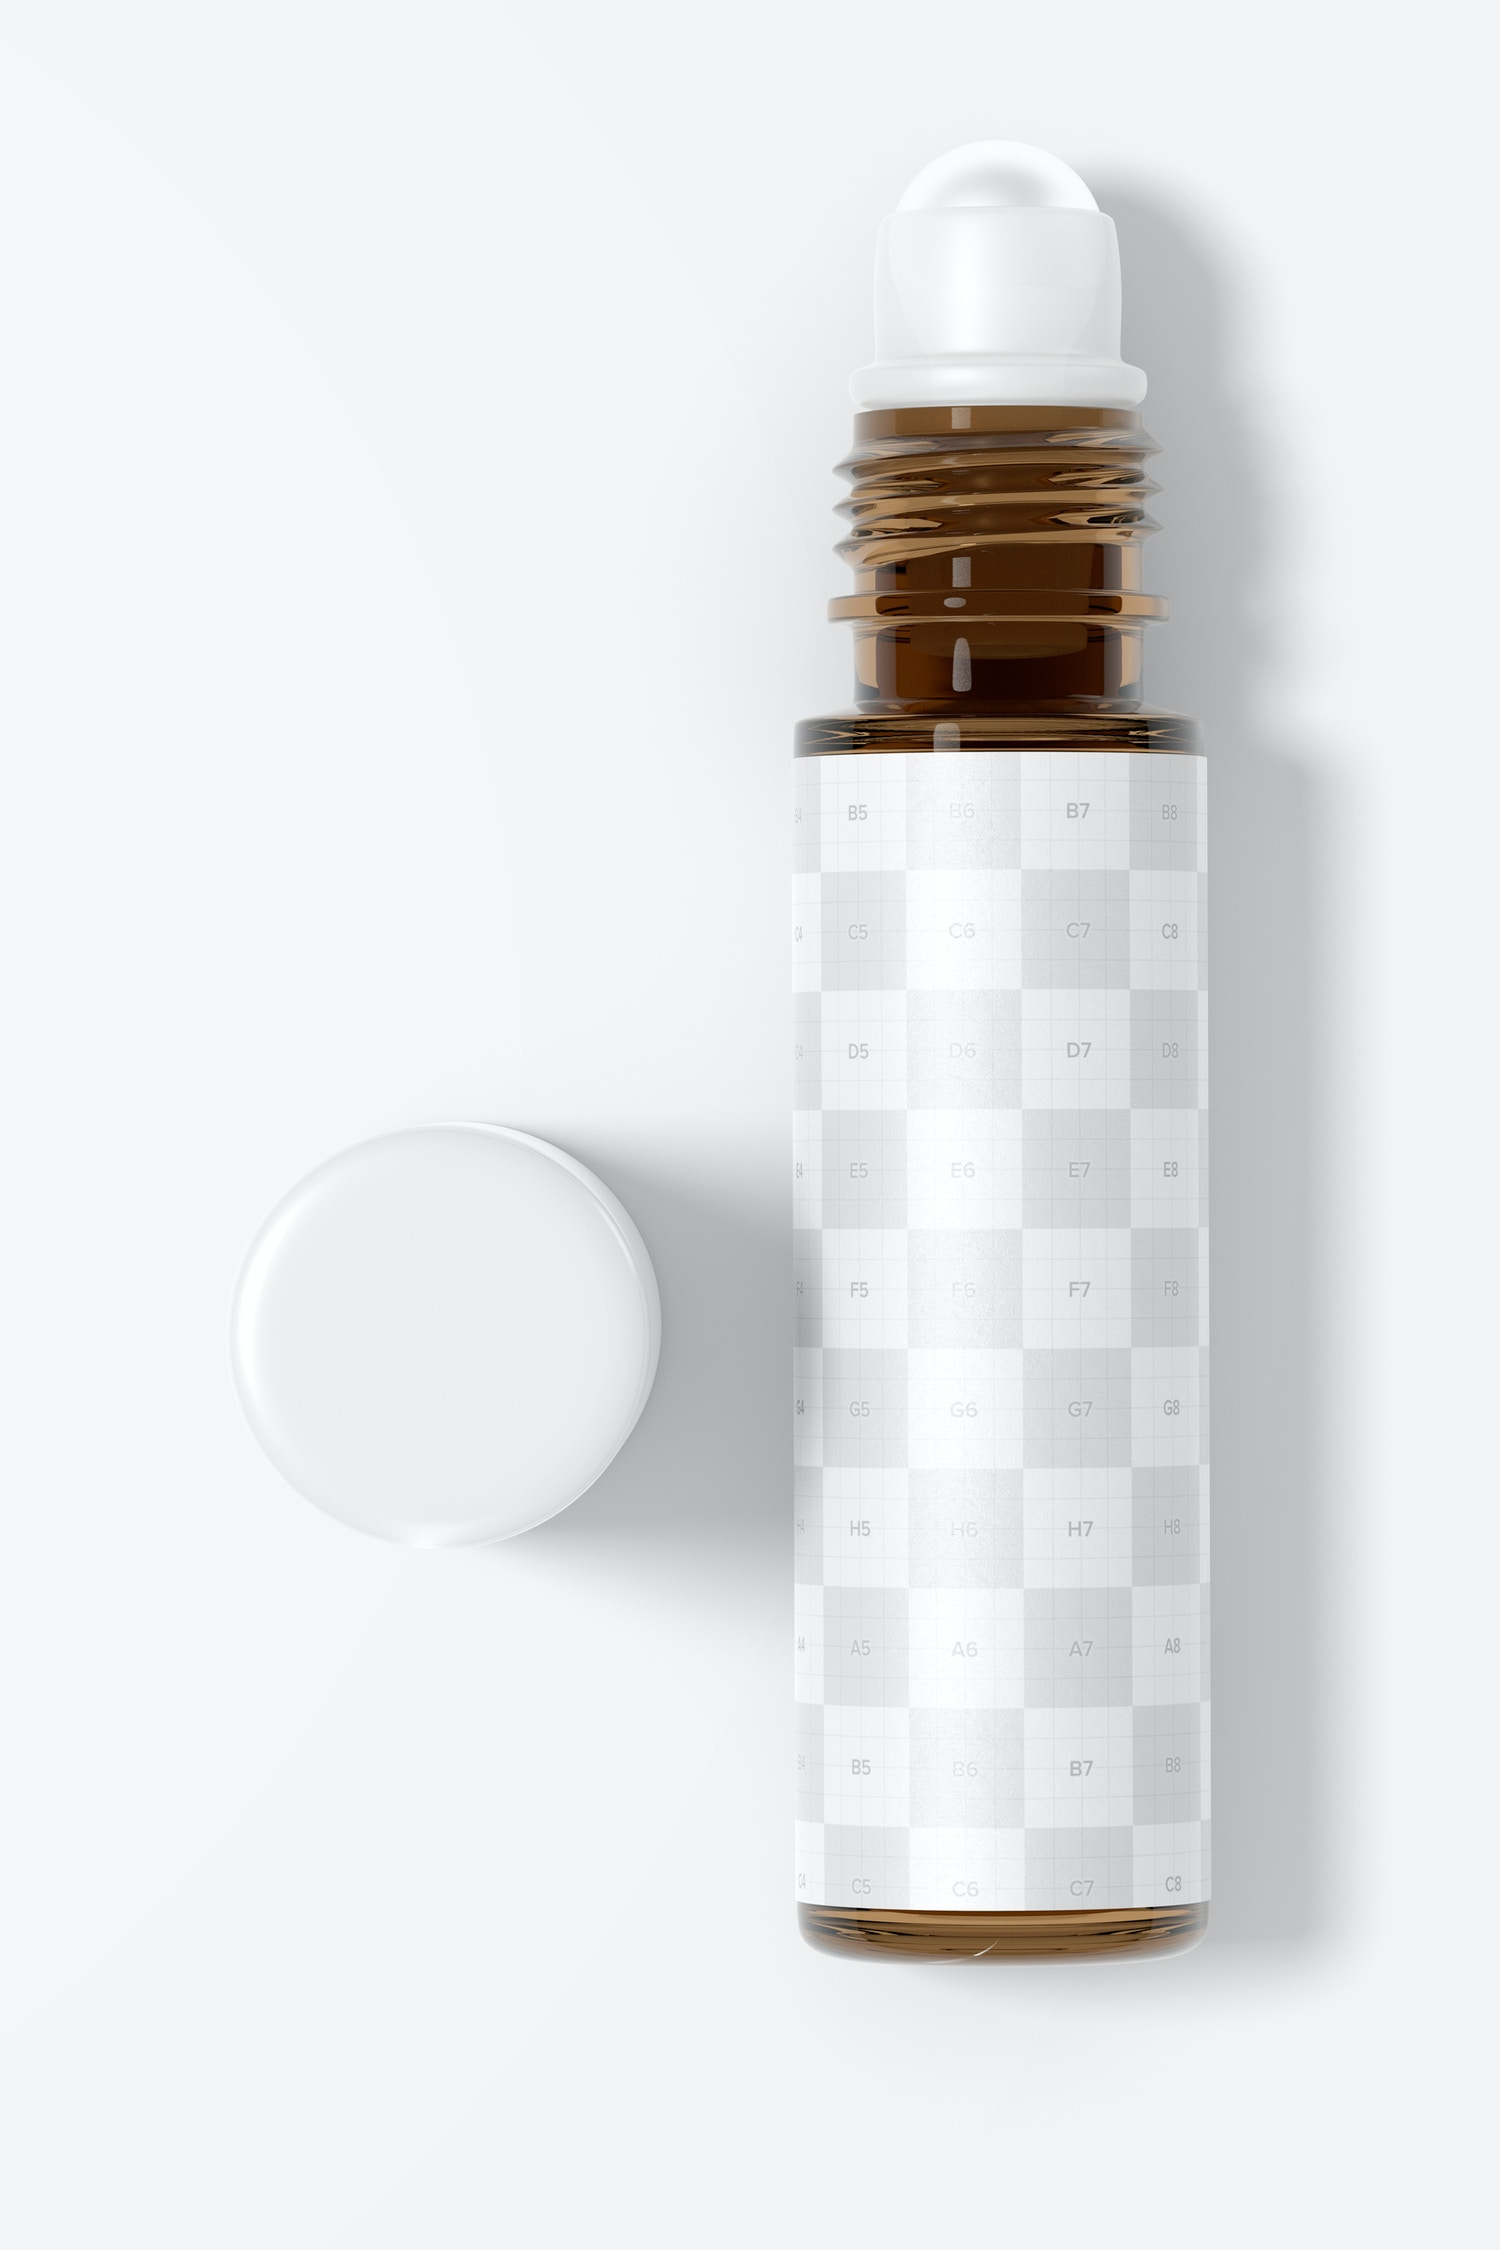 10 ml Roller Bottle Mockup, Top View